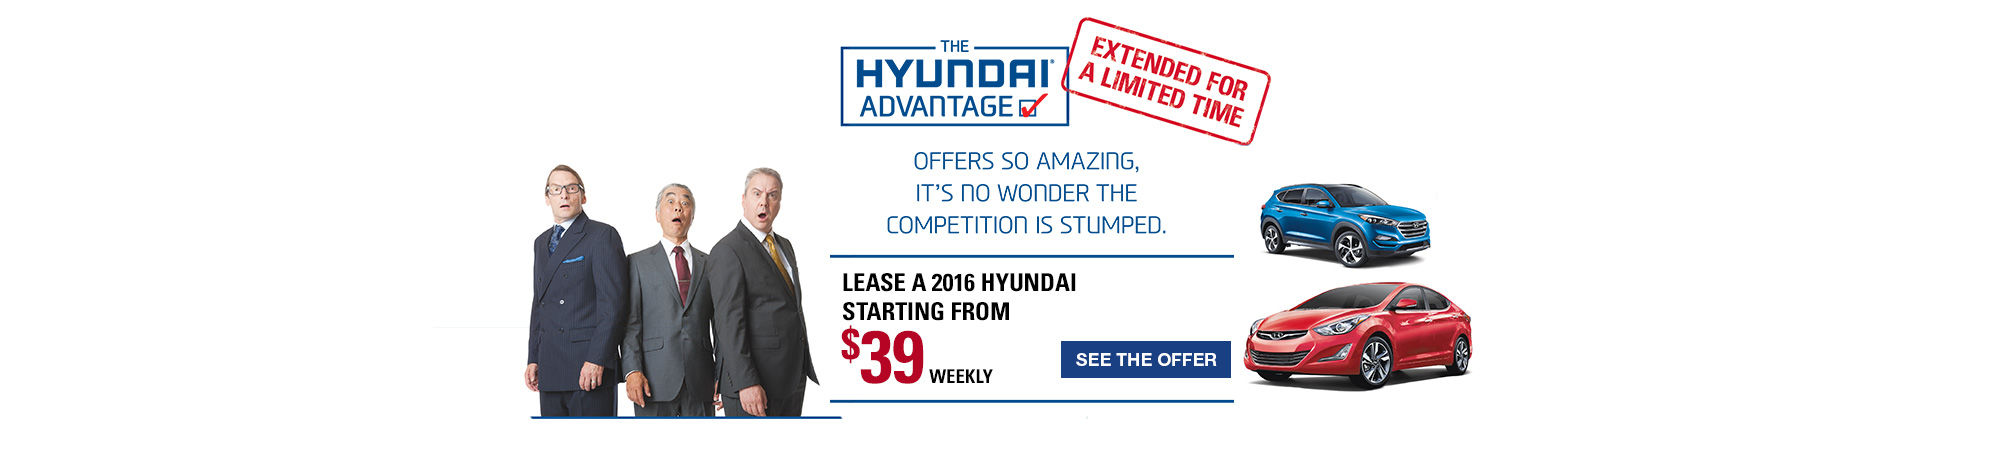 The Hyundai Advantage - event